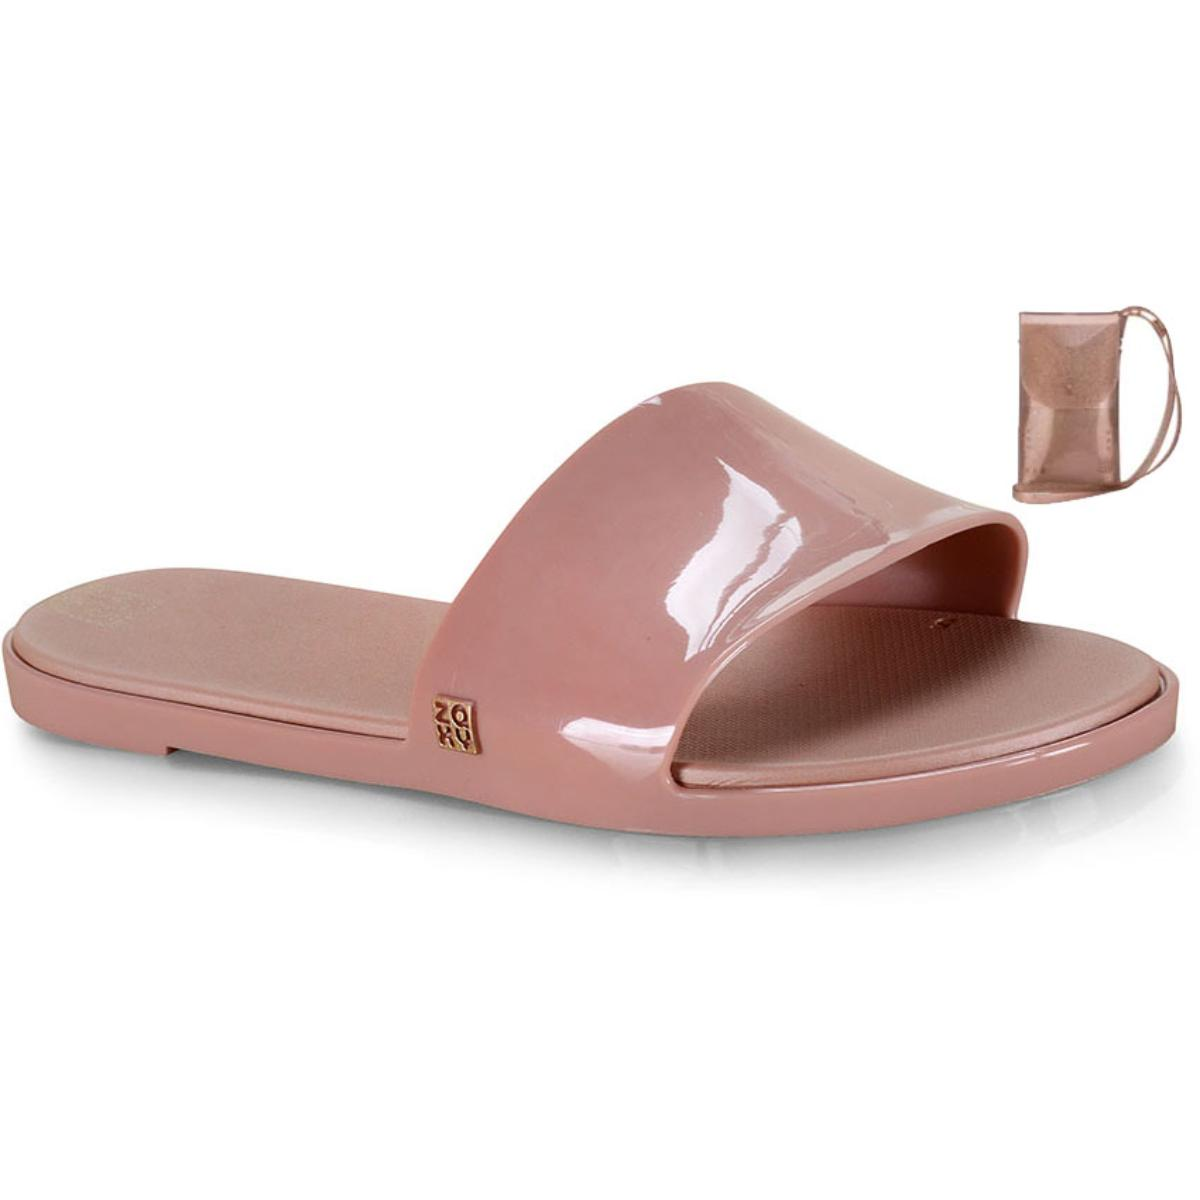 Tamanco Feminino Grendene 17996  90944 Zaxy Slide Hit+minibag Rosa Vintage